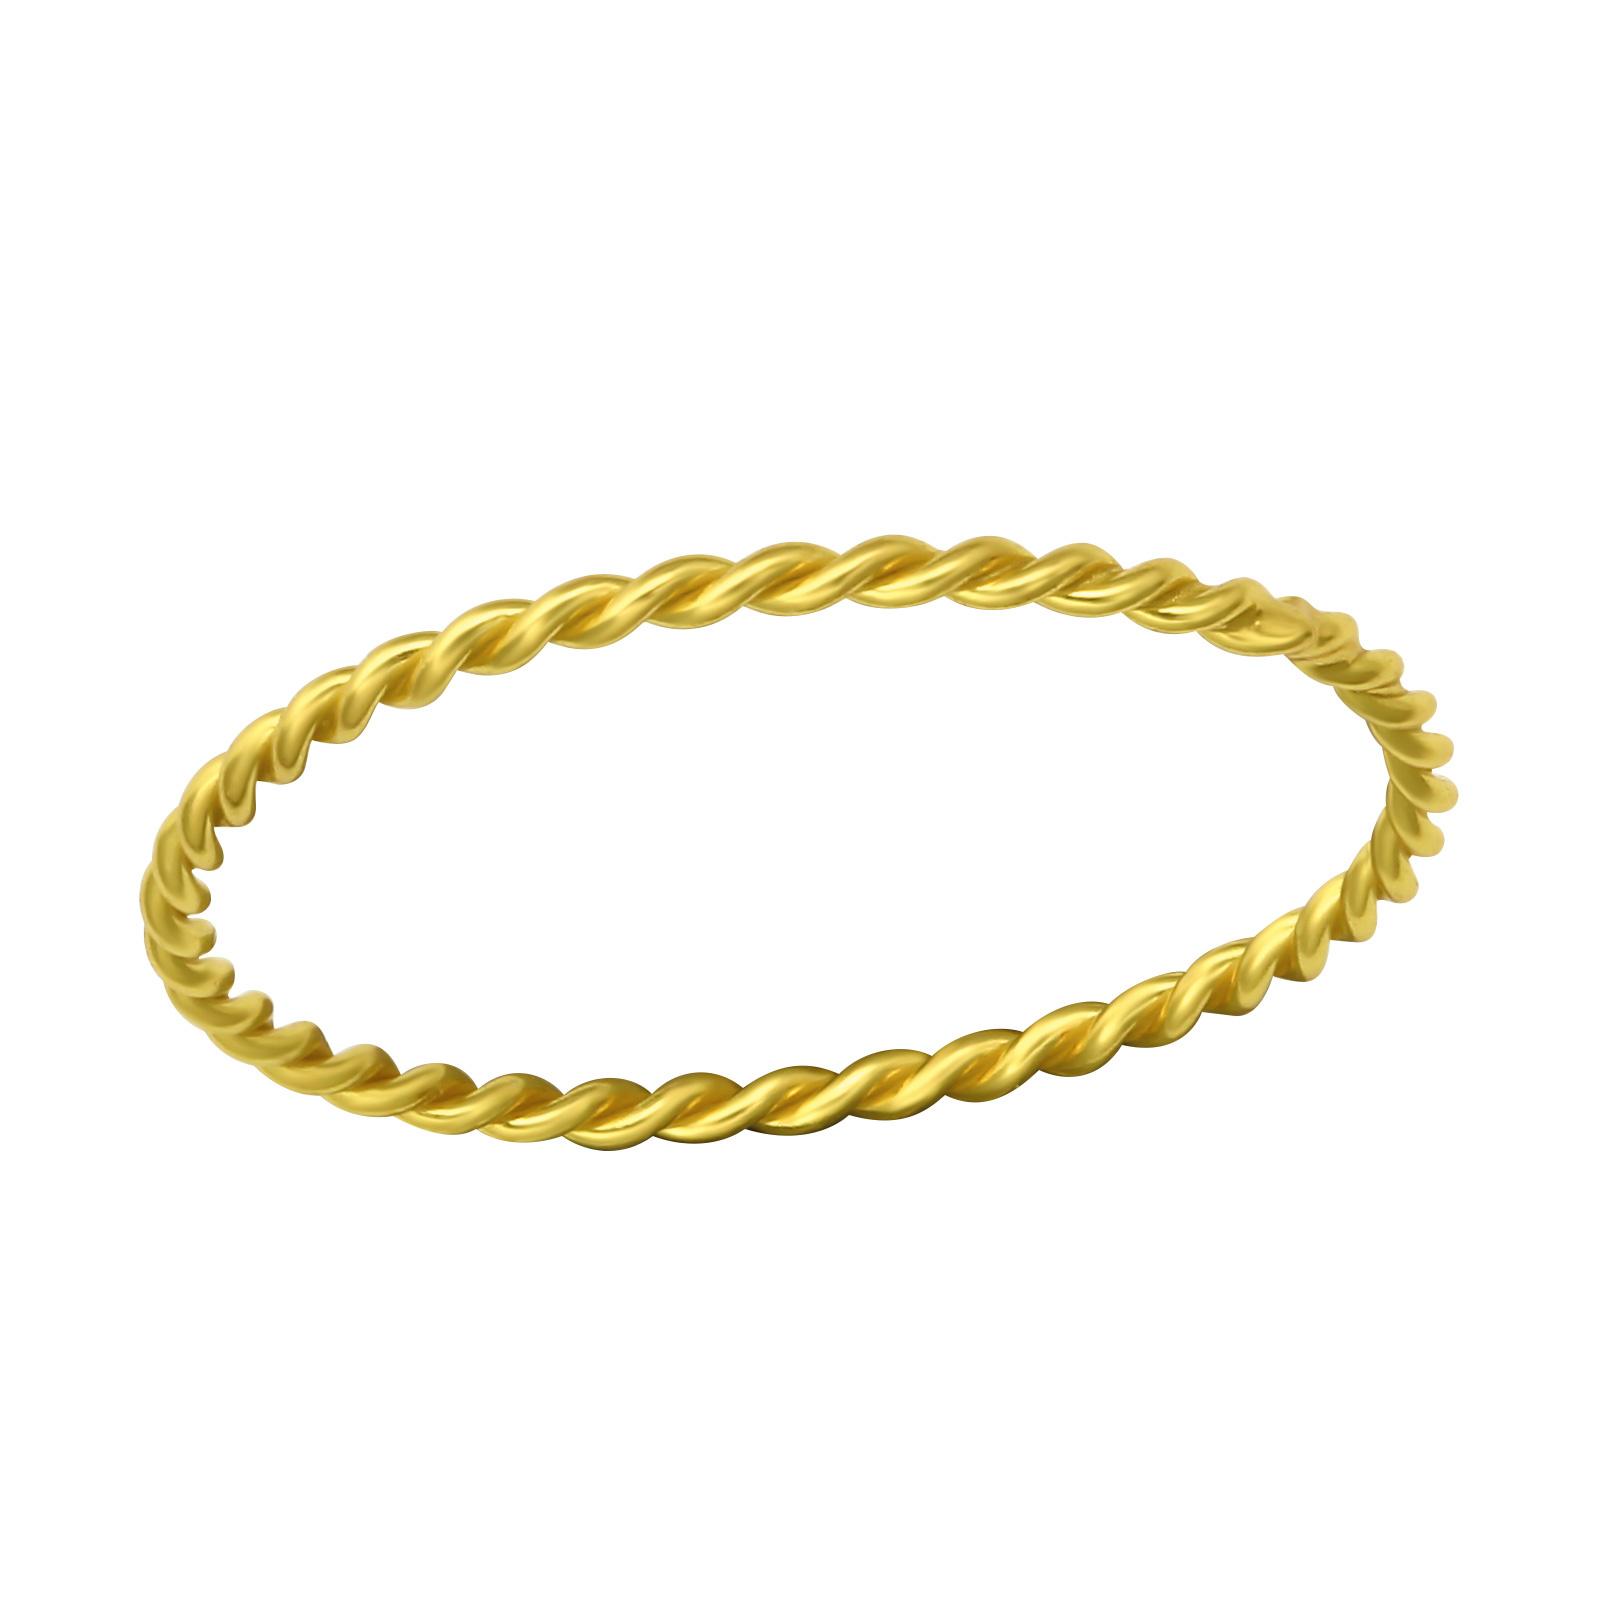 Fein geflochtener Ring aus 925er Sterling Silber - Gold-1